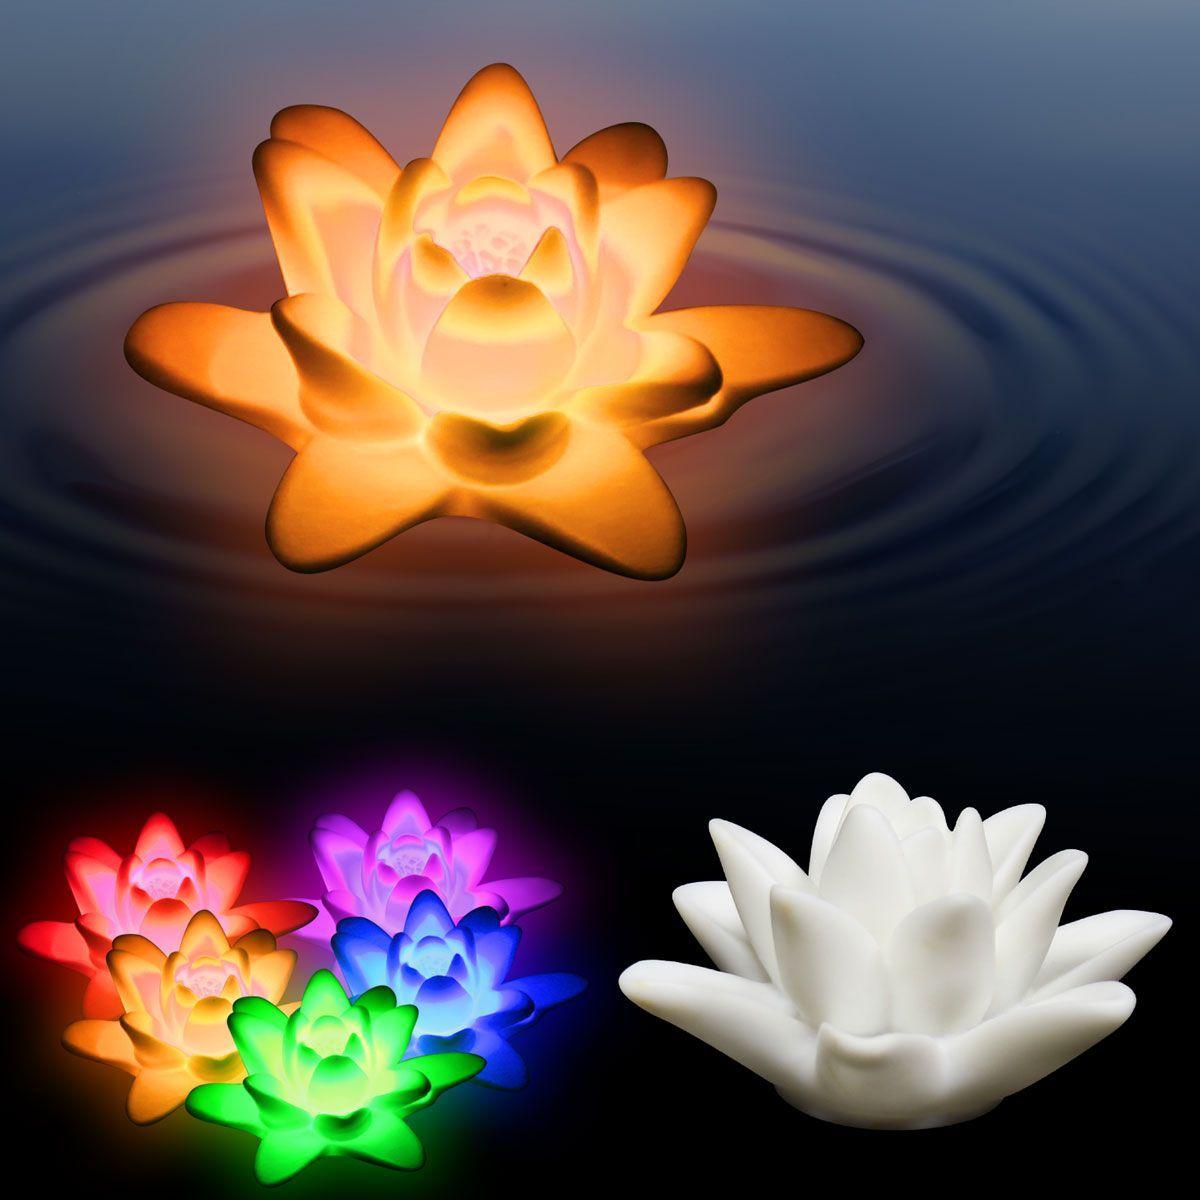 Led floating lotus flower windy city novelties wish listlol led floating lotus flower windy city novelties izmirmasajfo Gallery